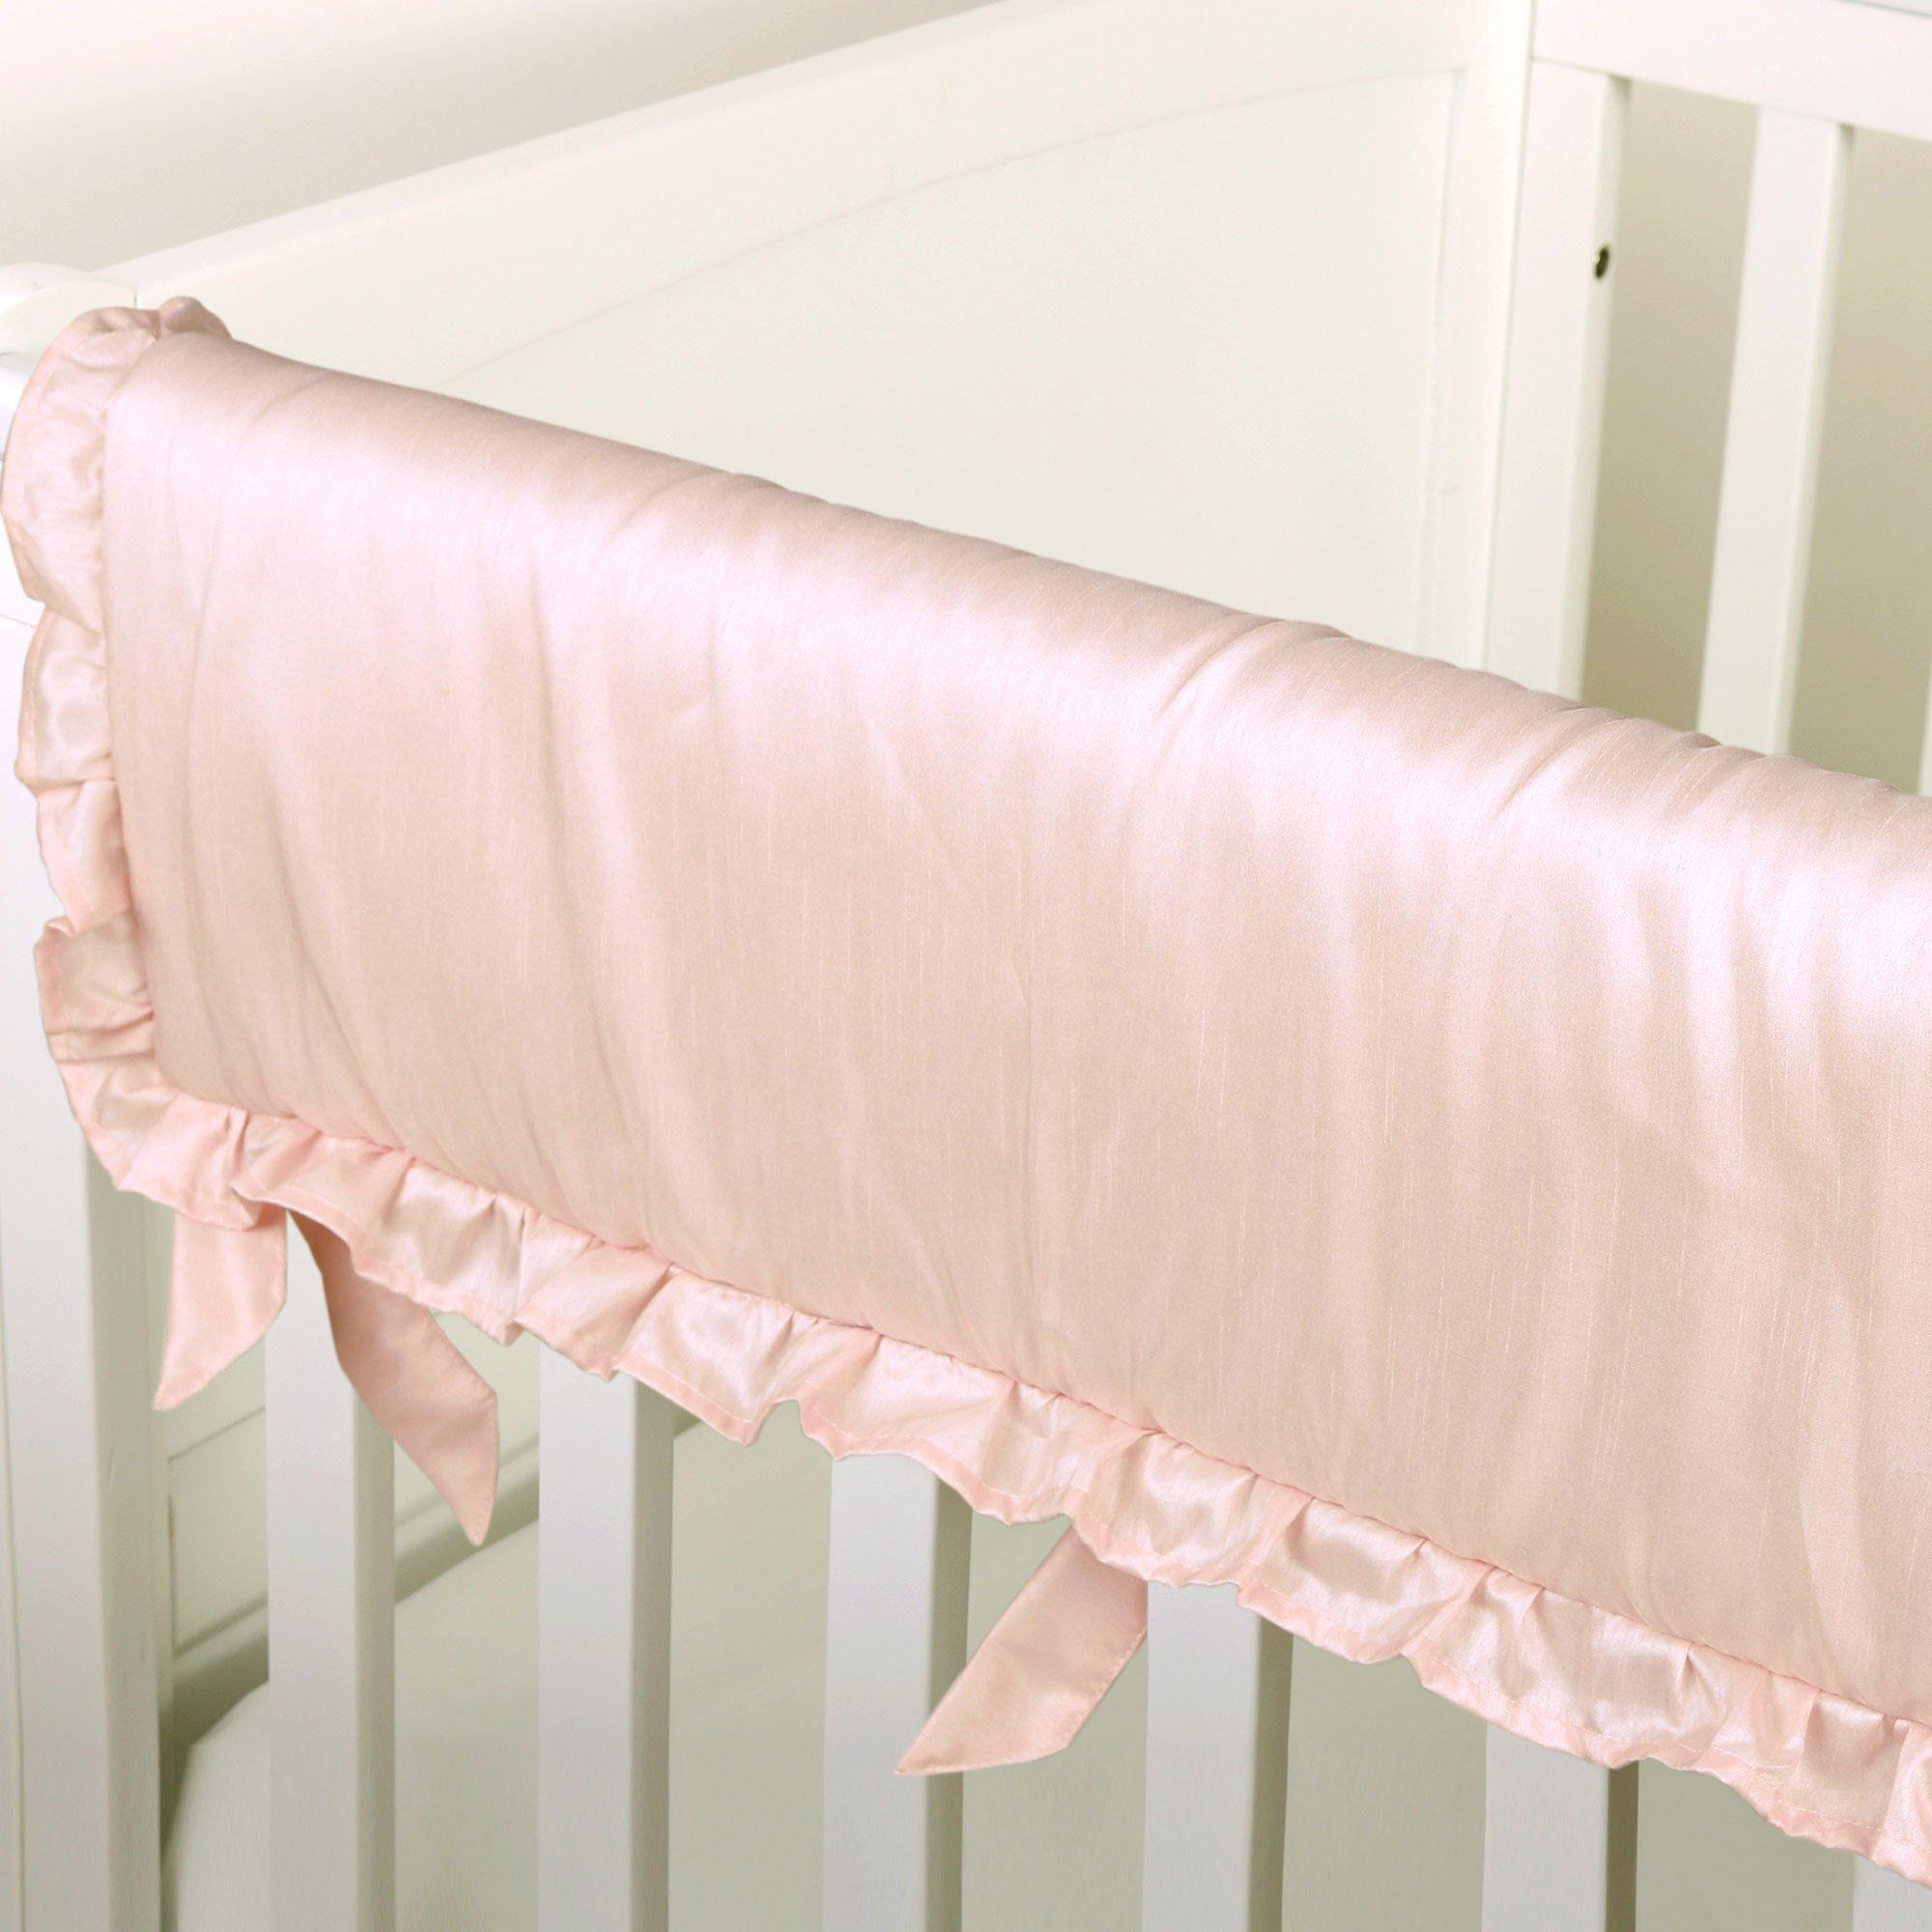 Arianna Pink Padded Crib Rail Guard by The Peanut Shell